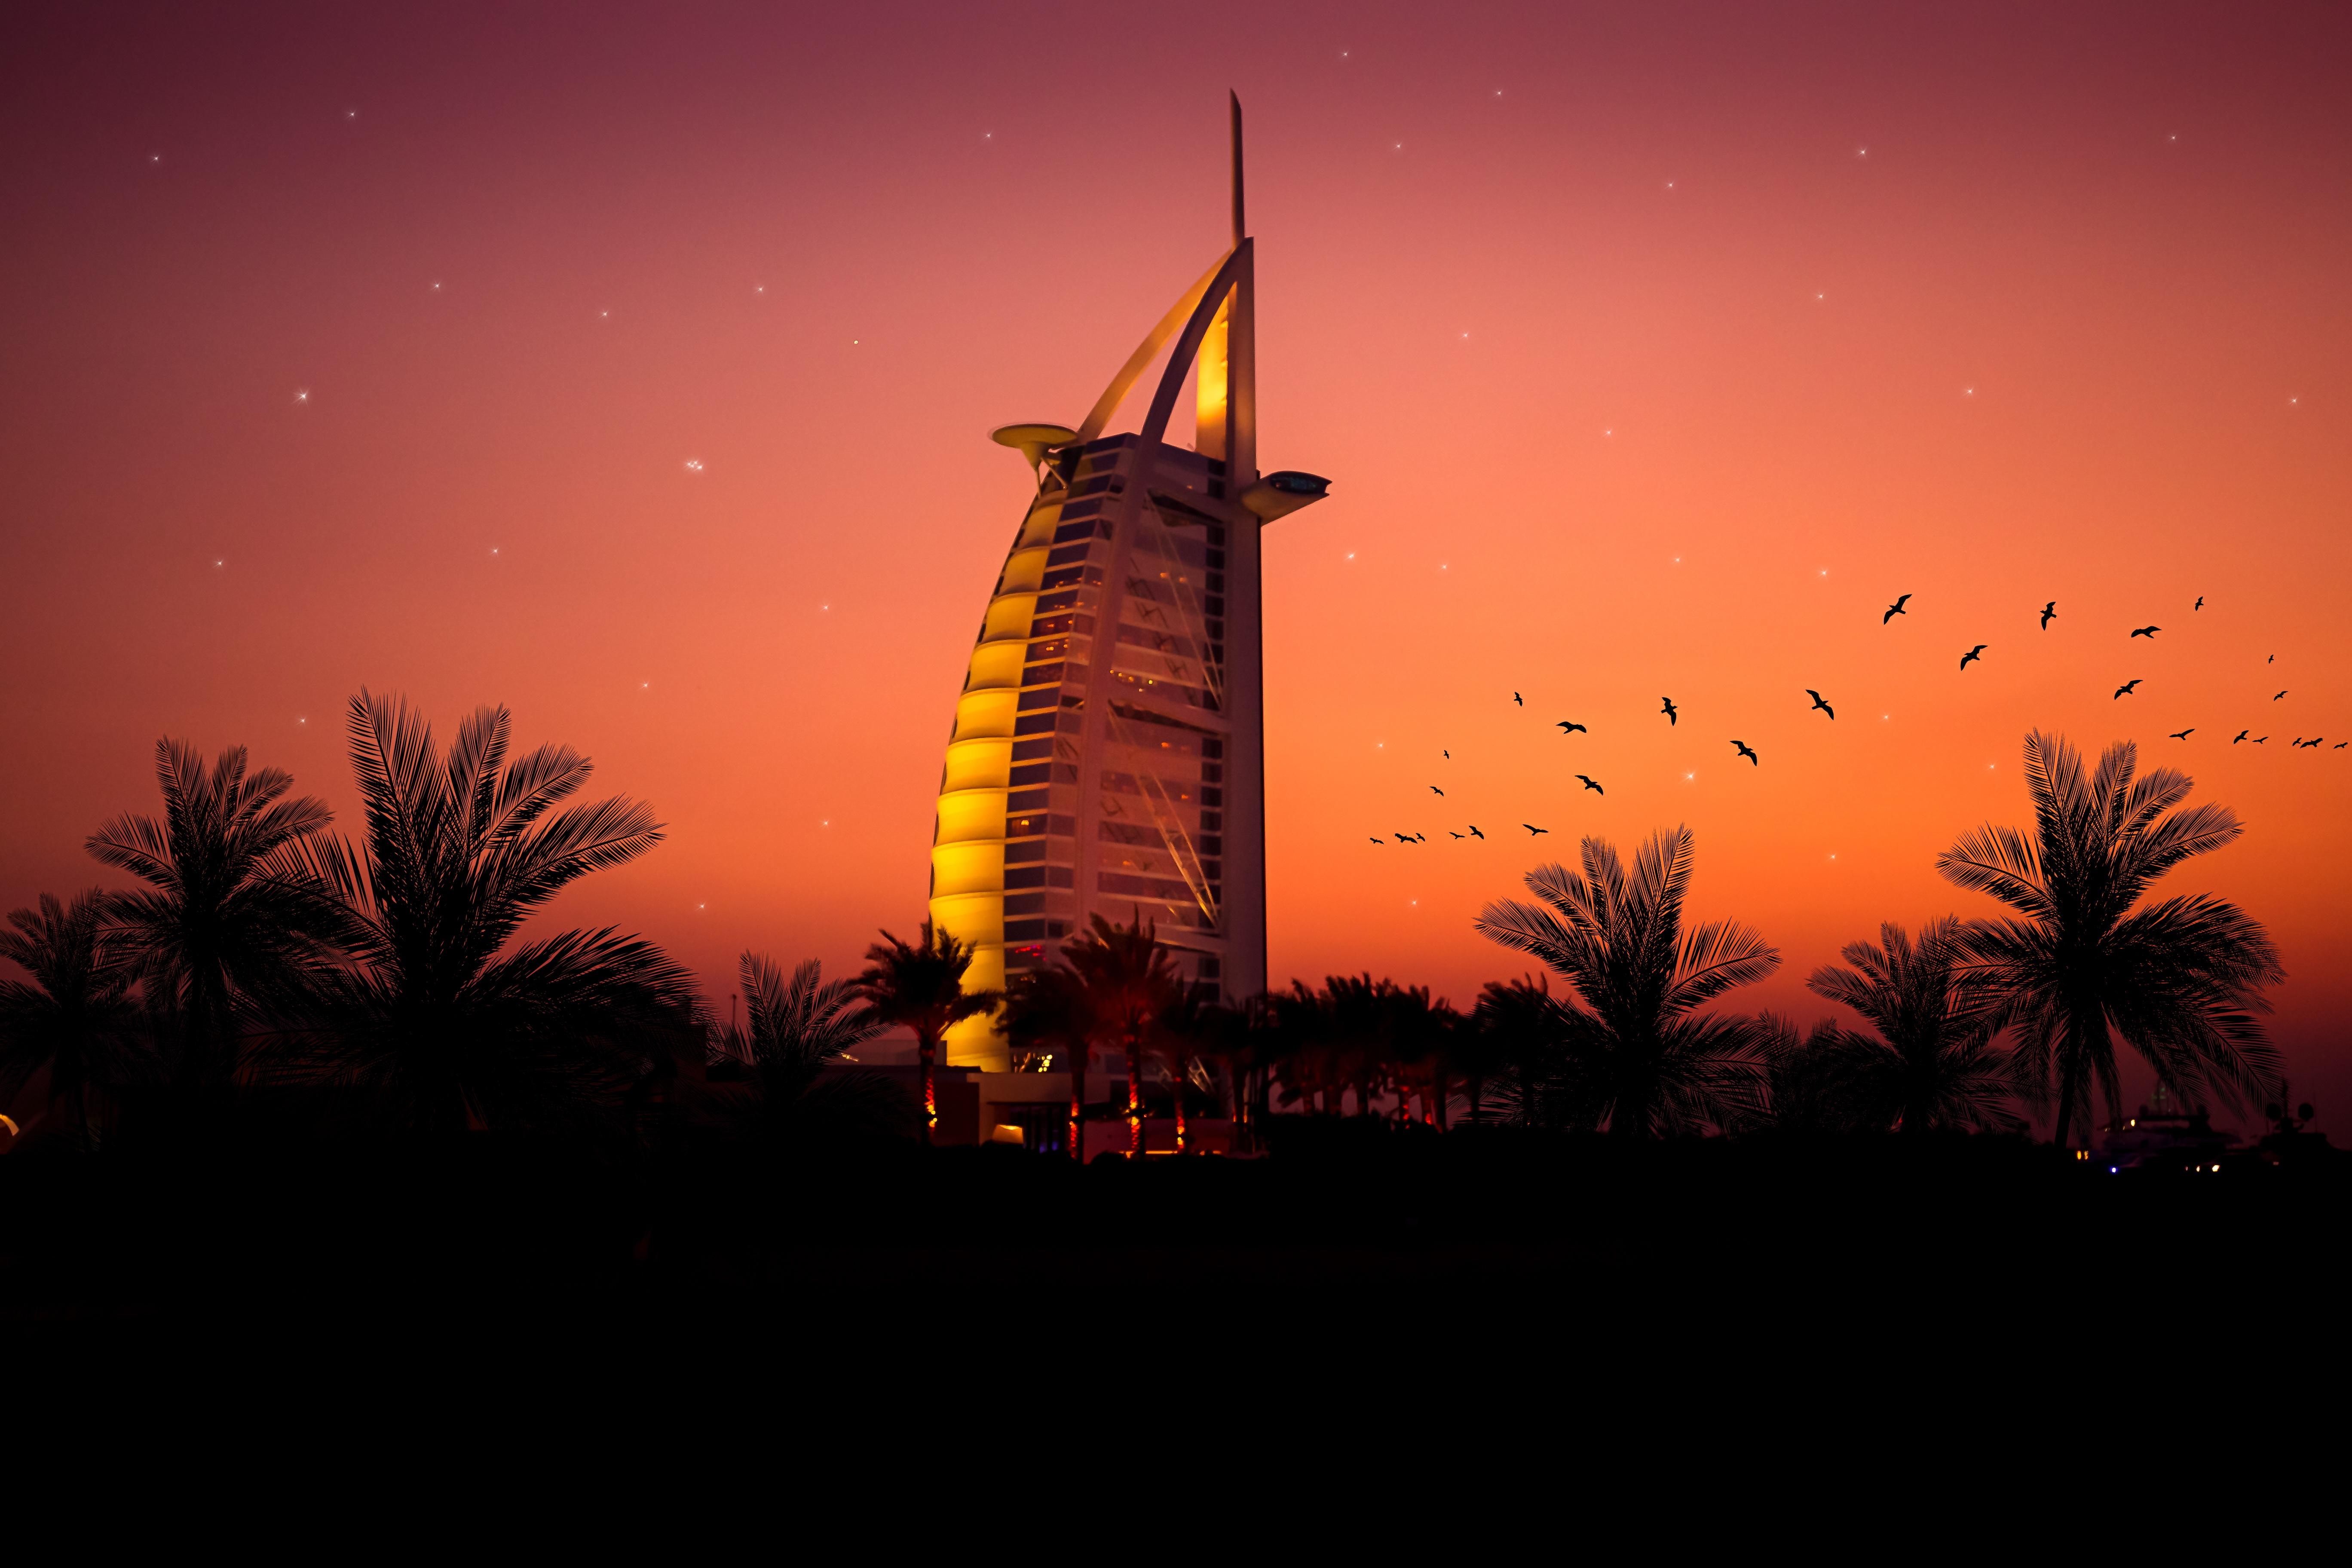 Burj Al Arab, HD World, 4k Wallpapers, Images, Backgrounds ...